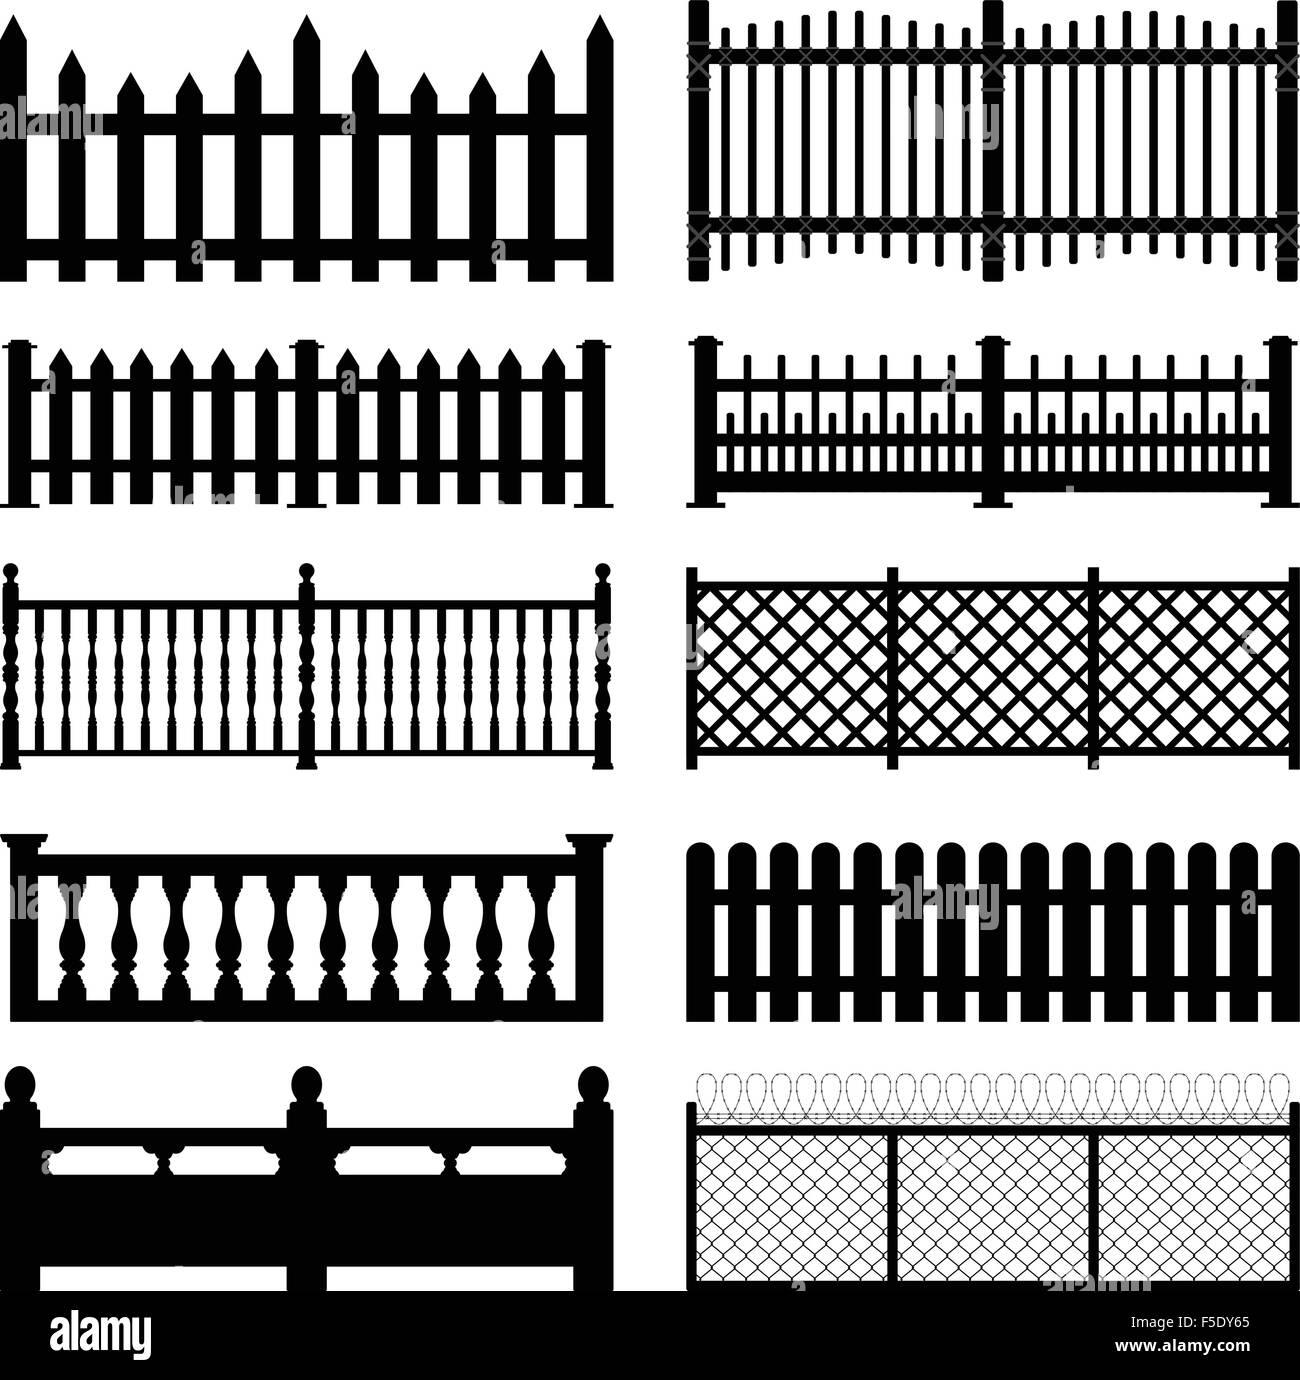 Fence Picket Wooden Wired Brick Garden Park Yard - Stock Vector